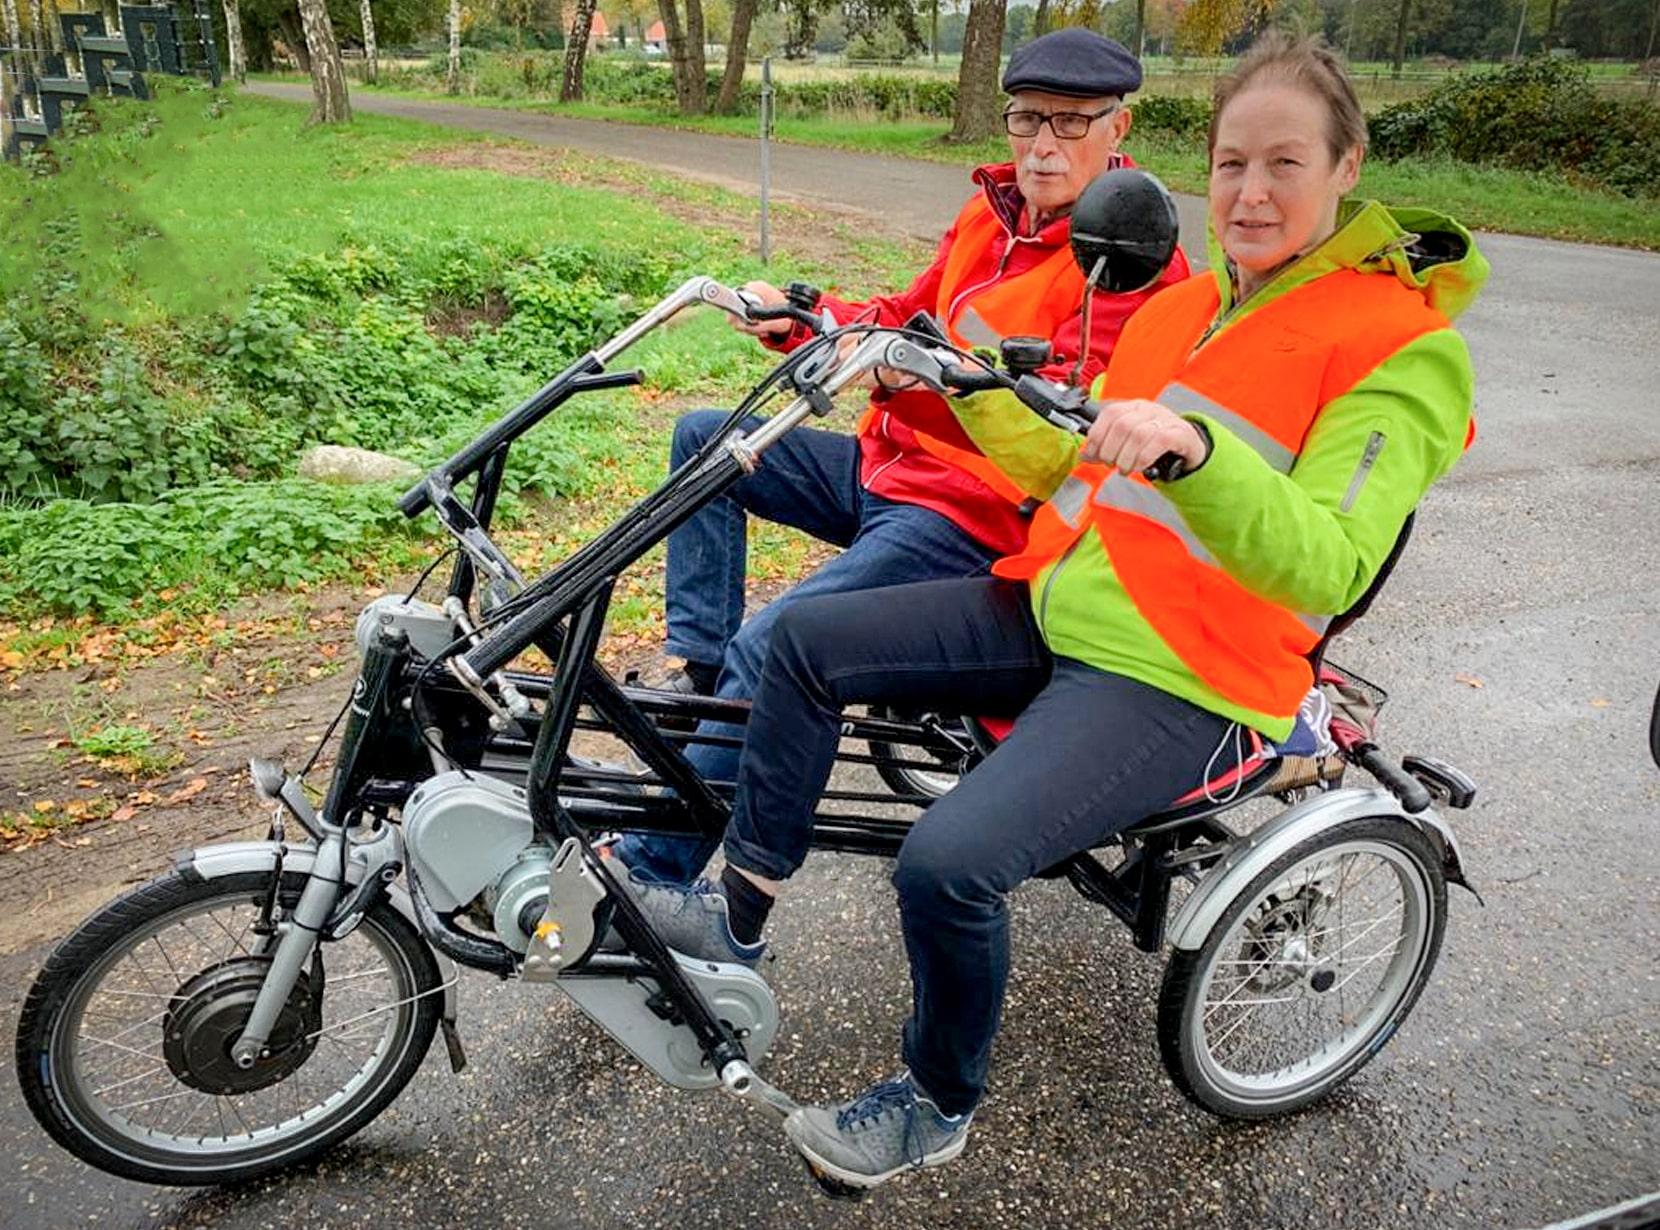 zorgimkerij-ecopoll-jouwdagbesteding.nl